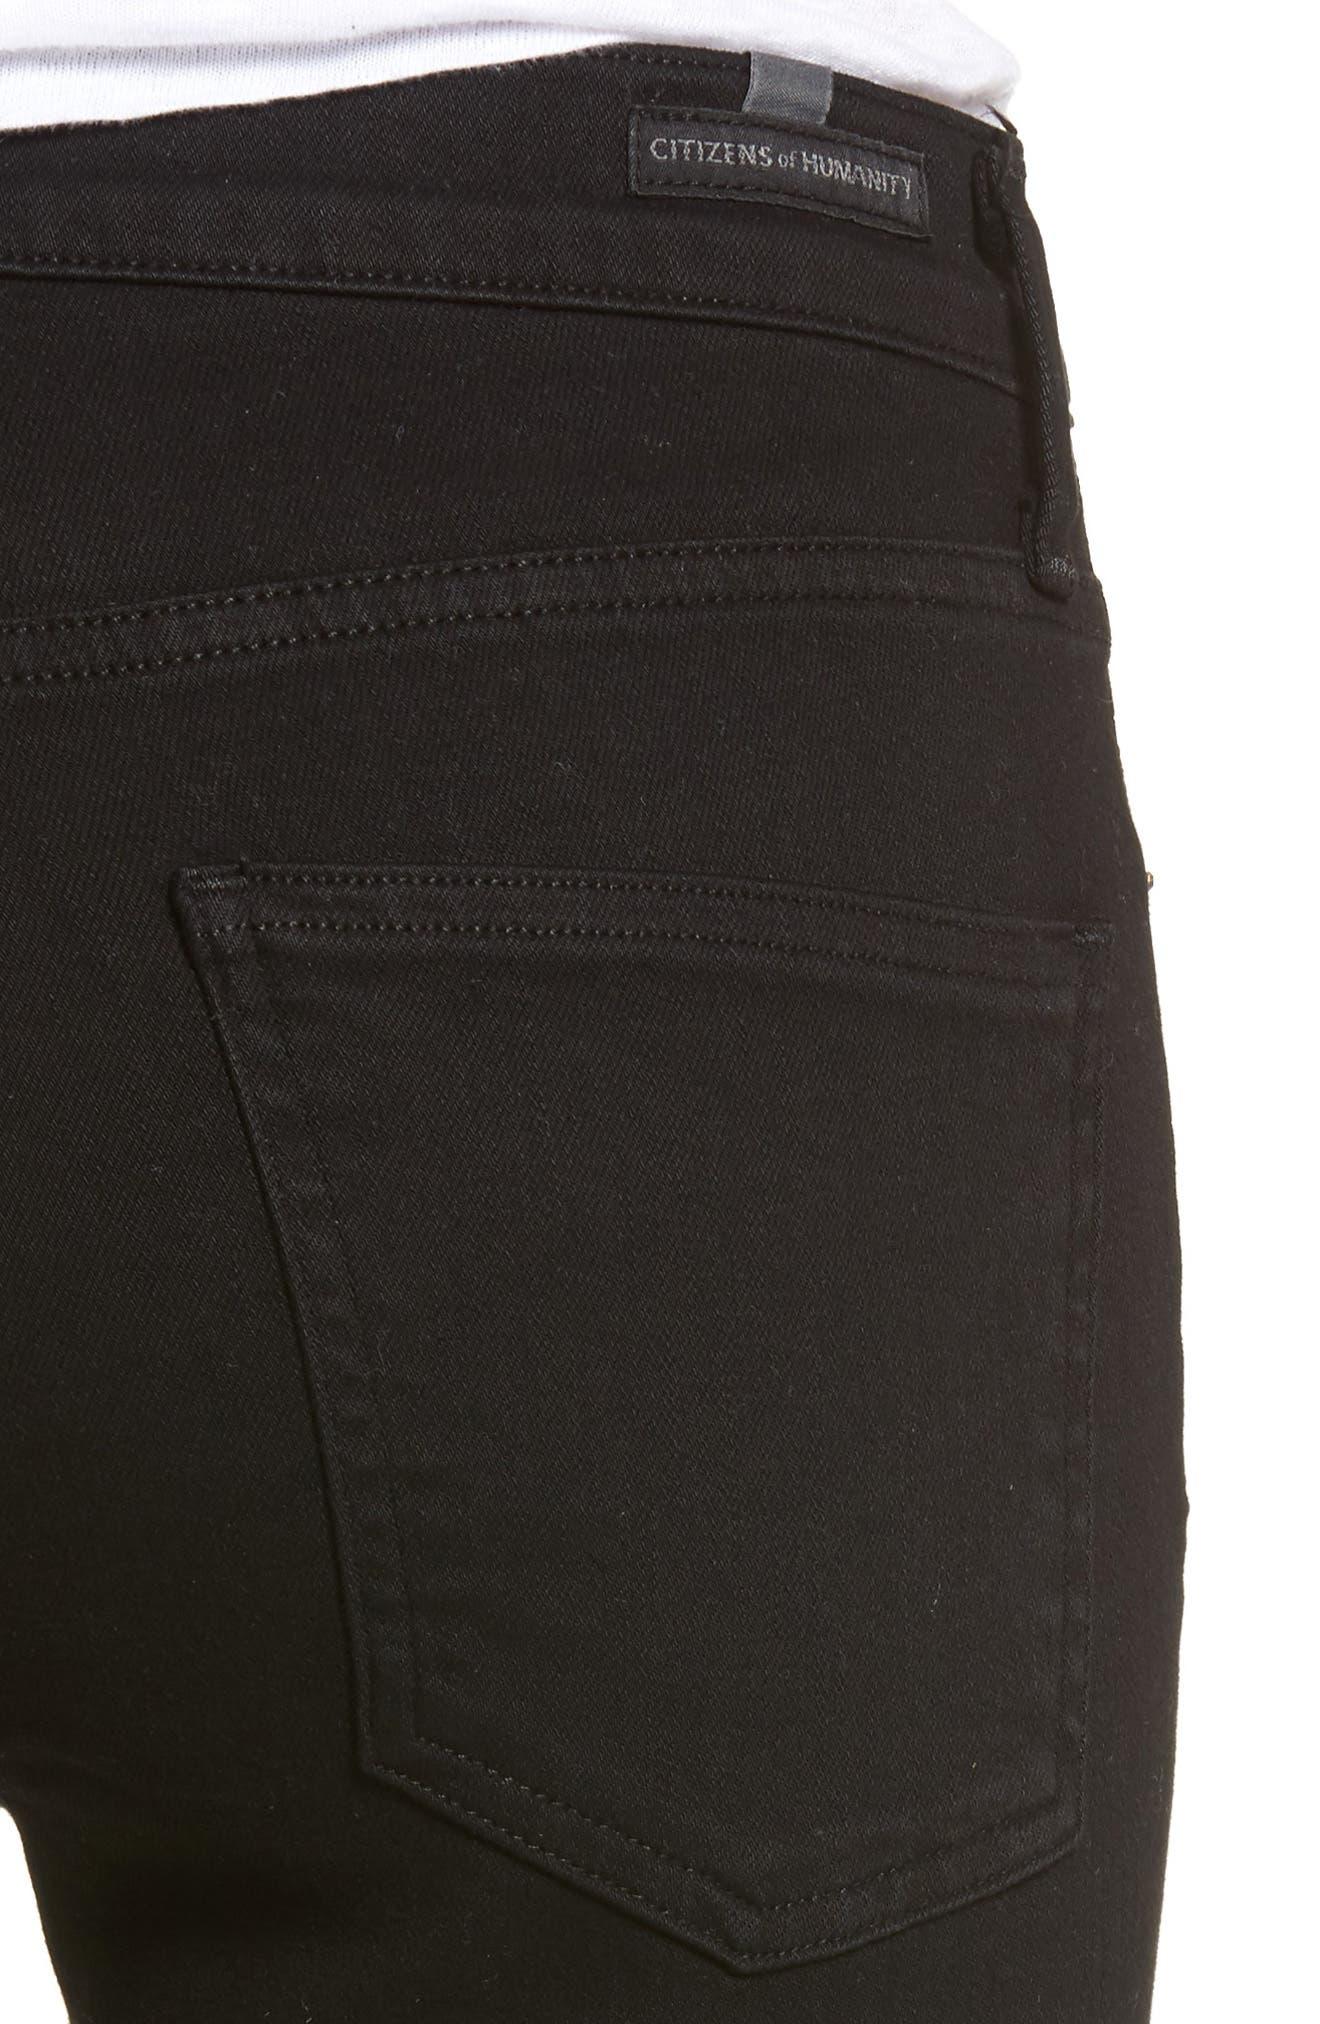 Rocket Skinny Jeans,                             Alternate thumbnail 4, color,                             Blackbird